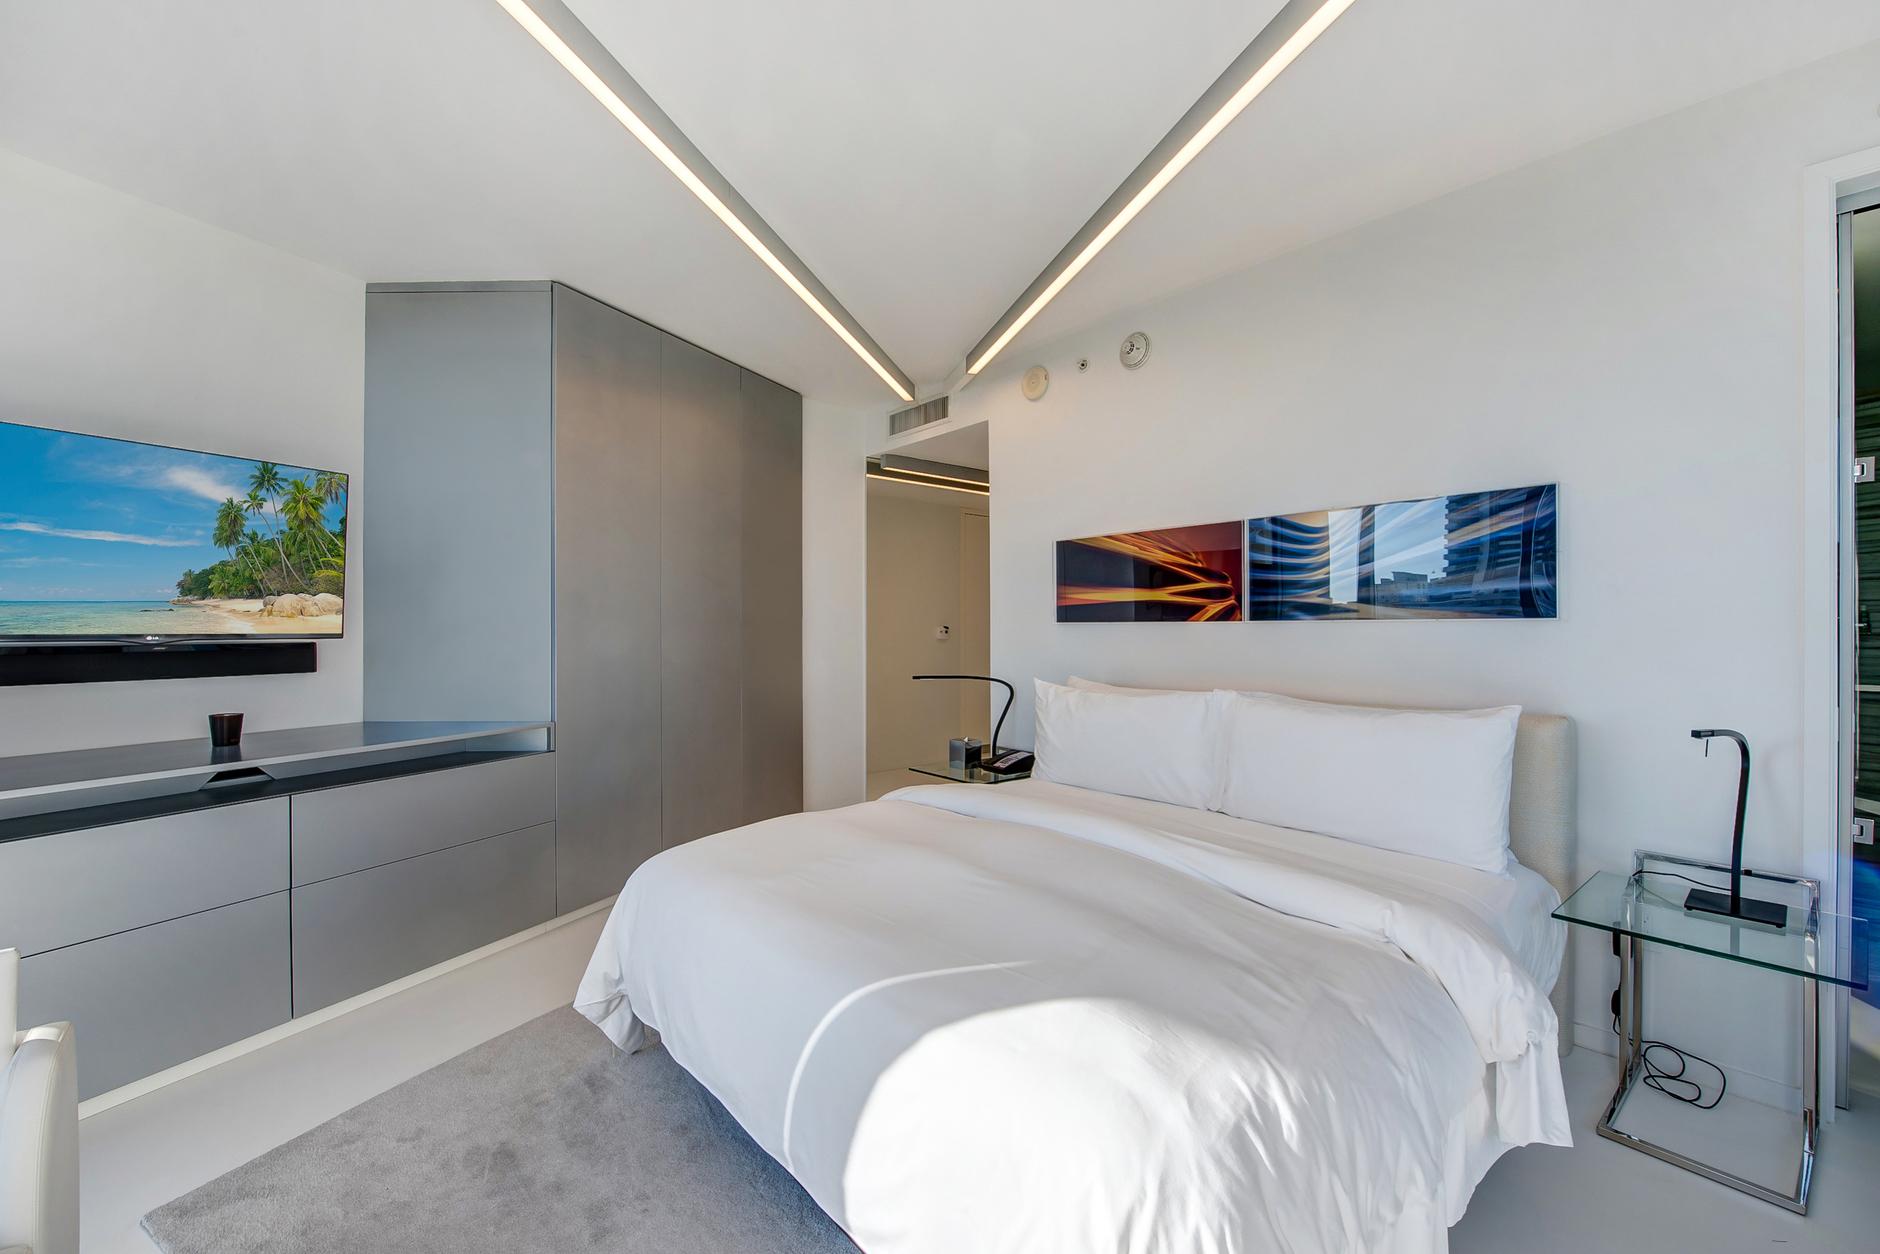 Квартира Захи Хадид в Майами продана за 5,75 млн долларов (галерея 6, фото 2)